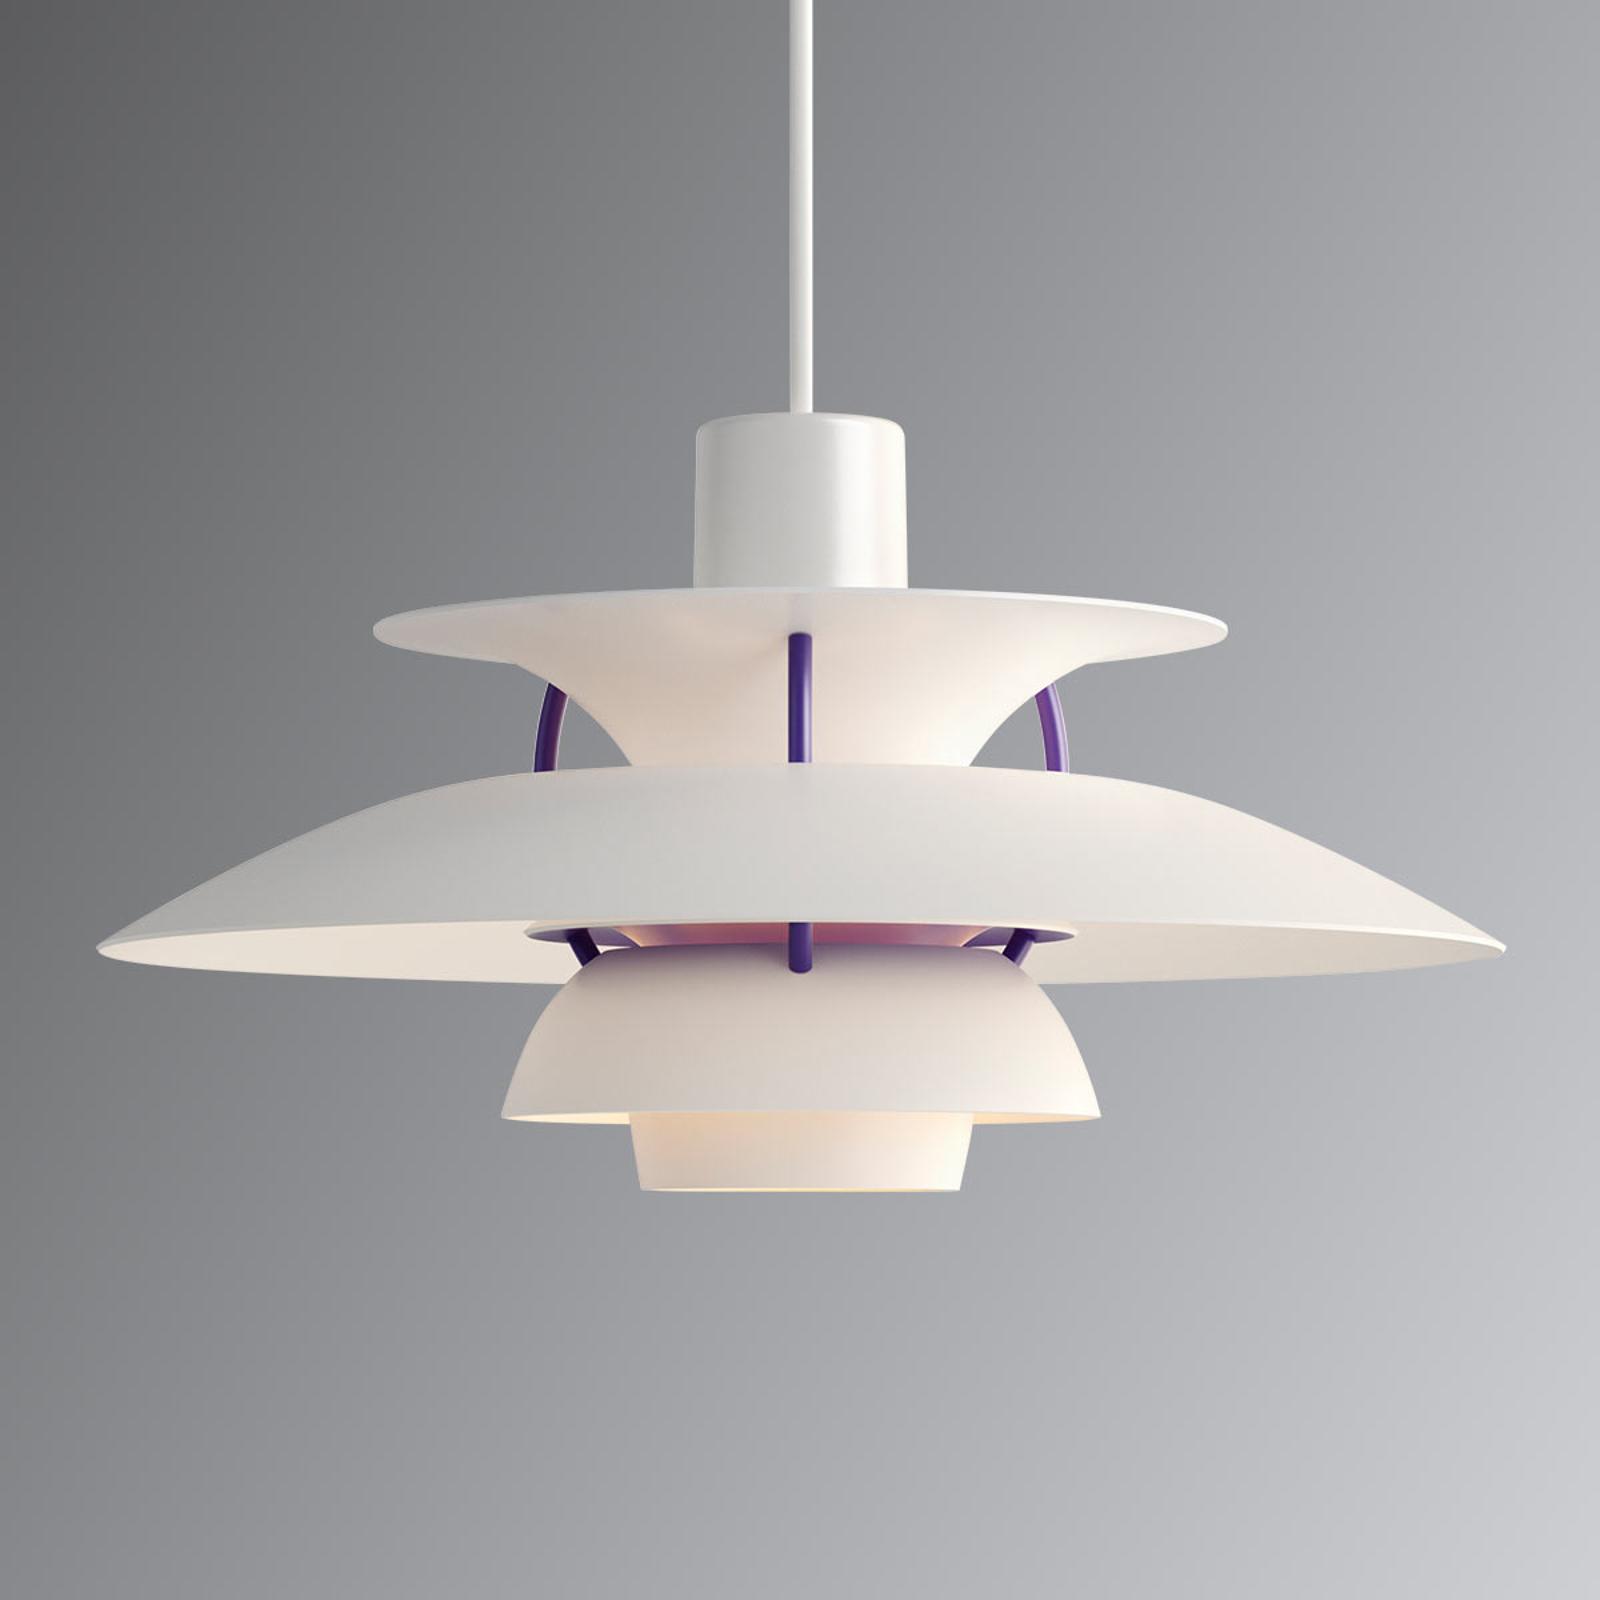 PH 5 Mini - designer hanglamp wit klassiek